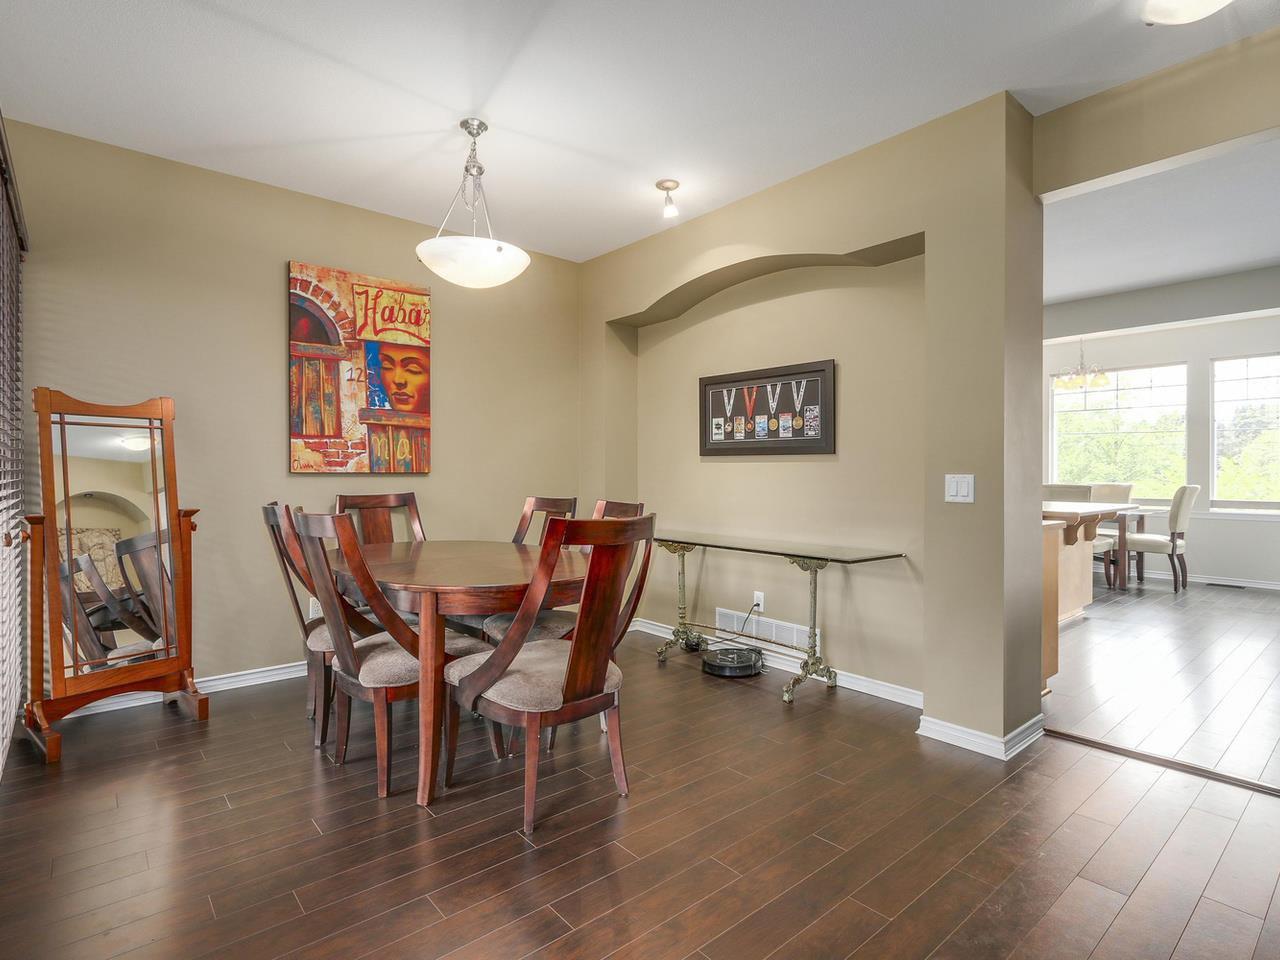 "Photo 4: Photos: 2 23233 KANAKA Way in Maple Ridge: Cottonwood MR Townhouse for sale in ""RIVERWOOD"" : MLS®# R2112549"